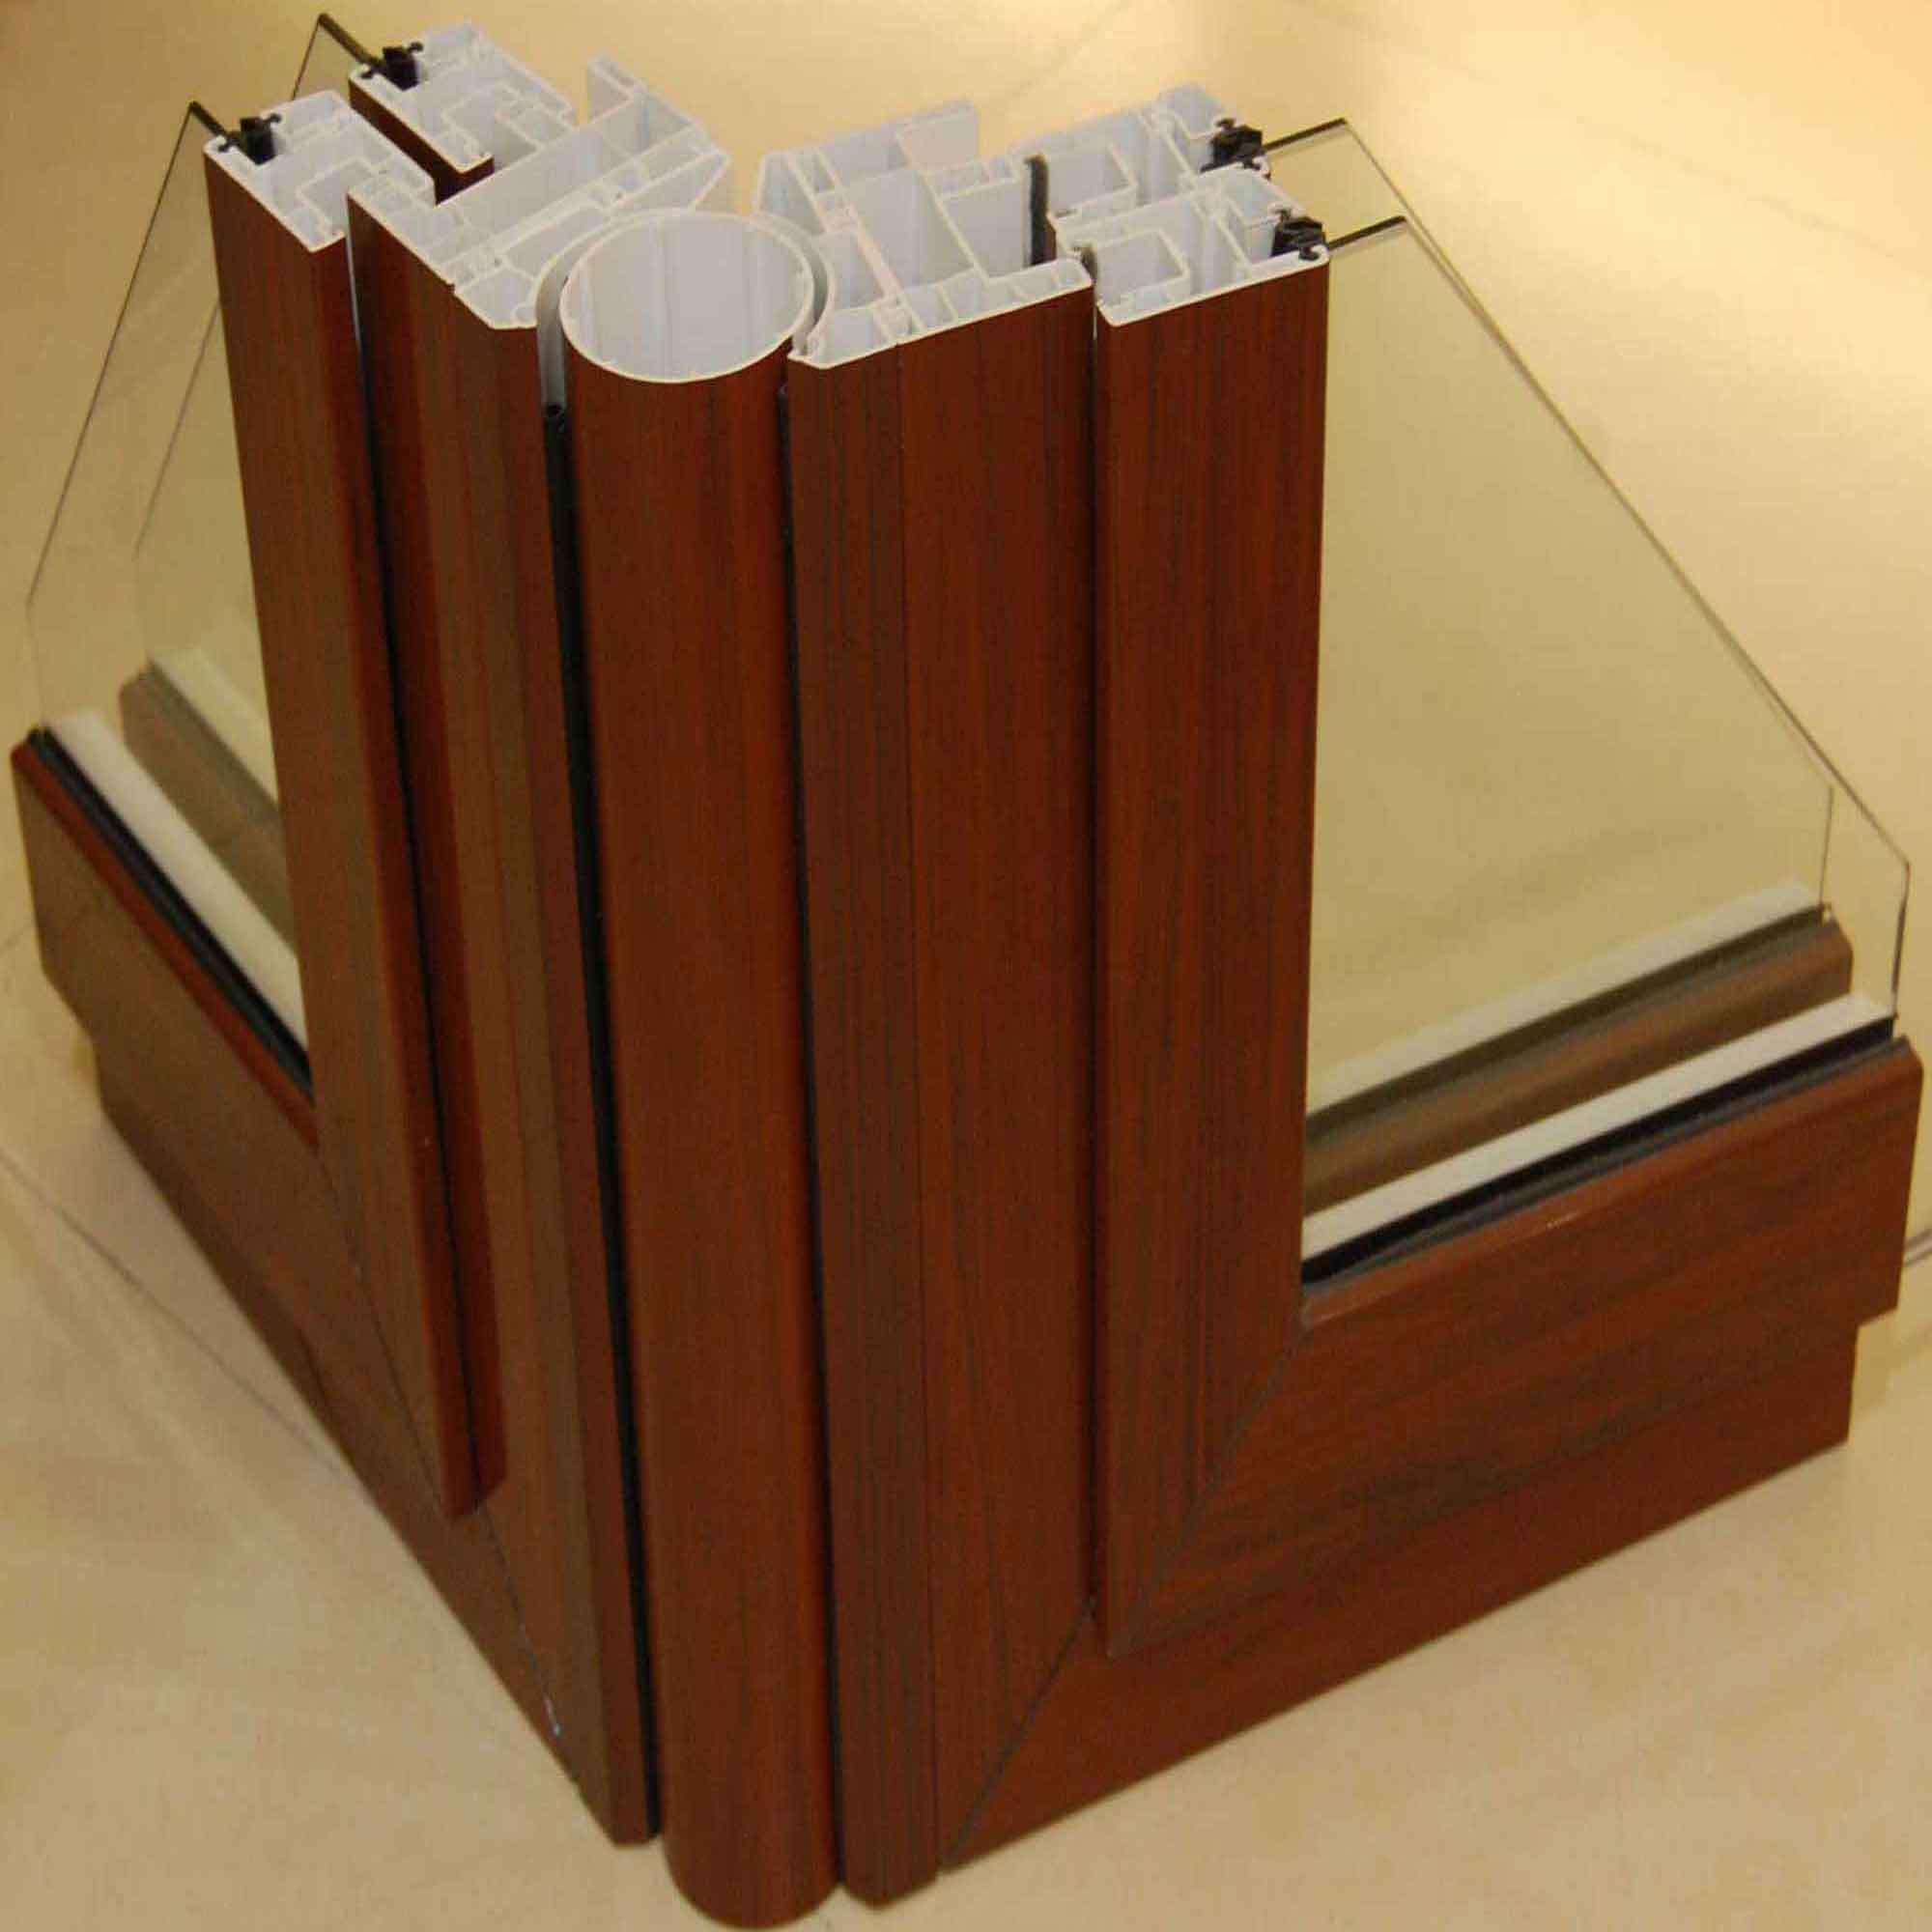 Wooden Co-Extrusion PVC Profile